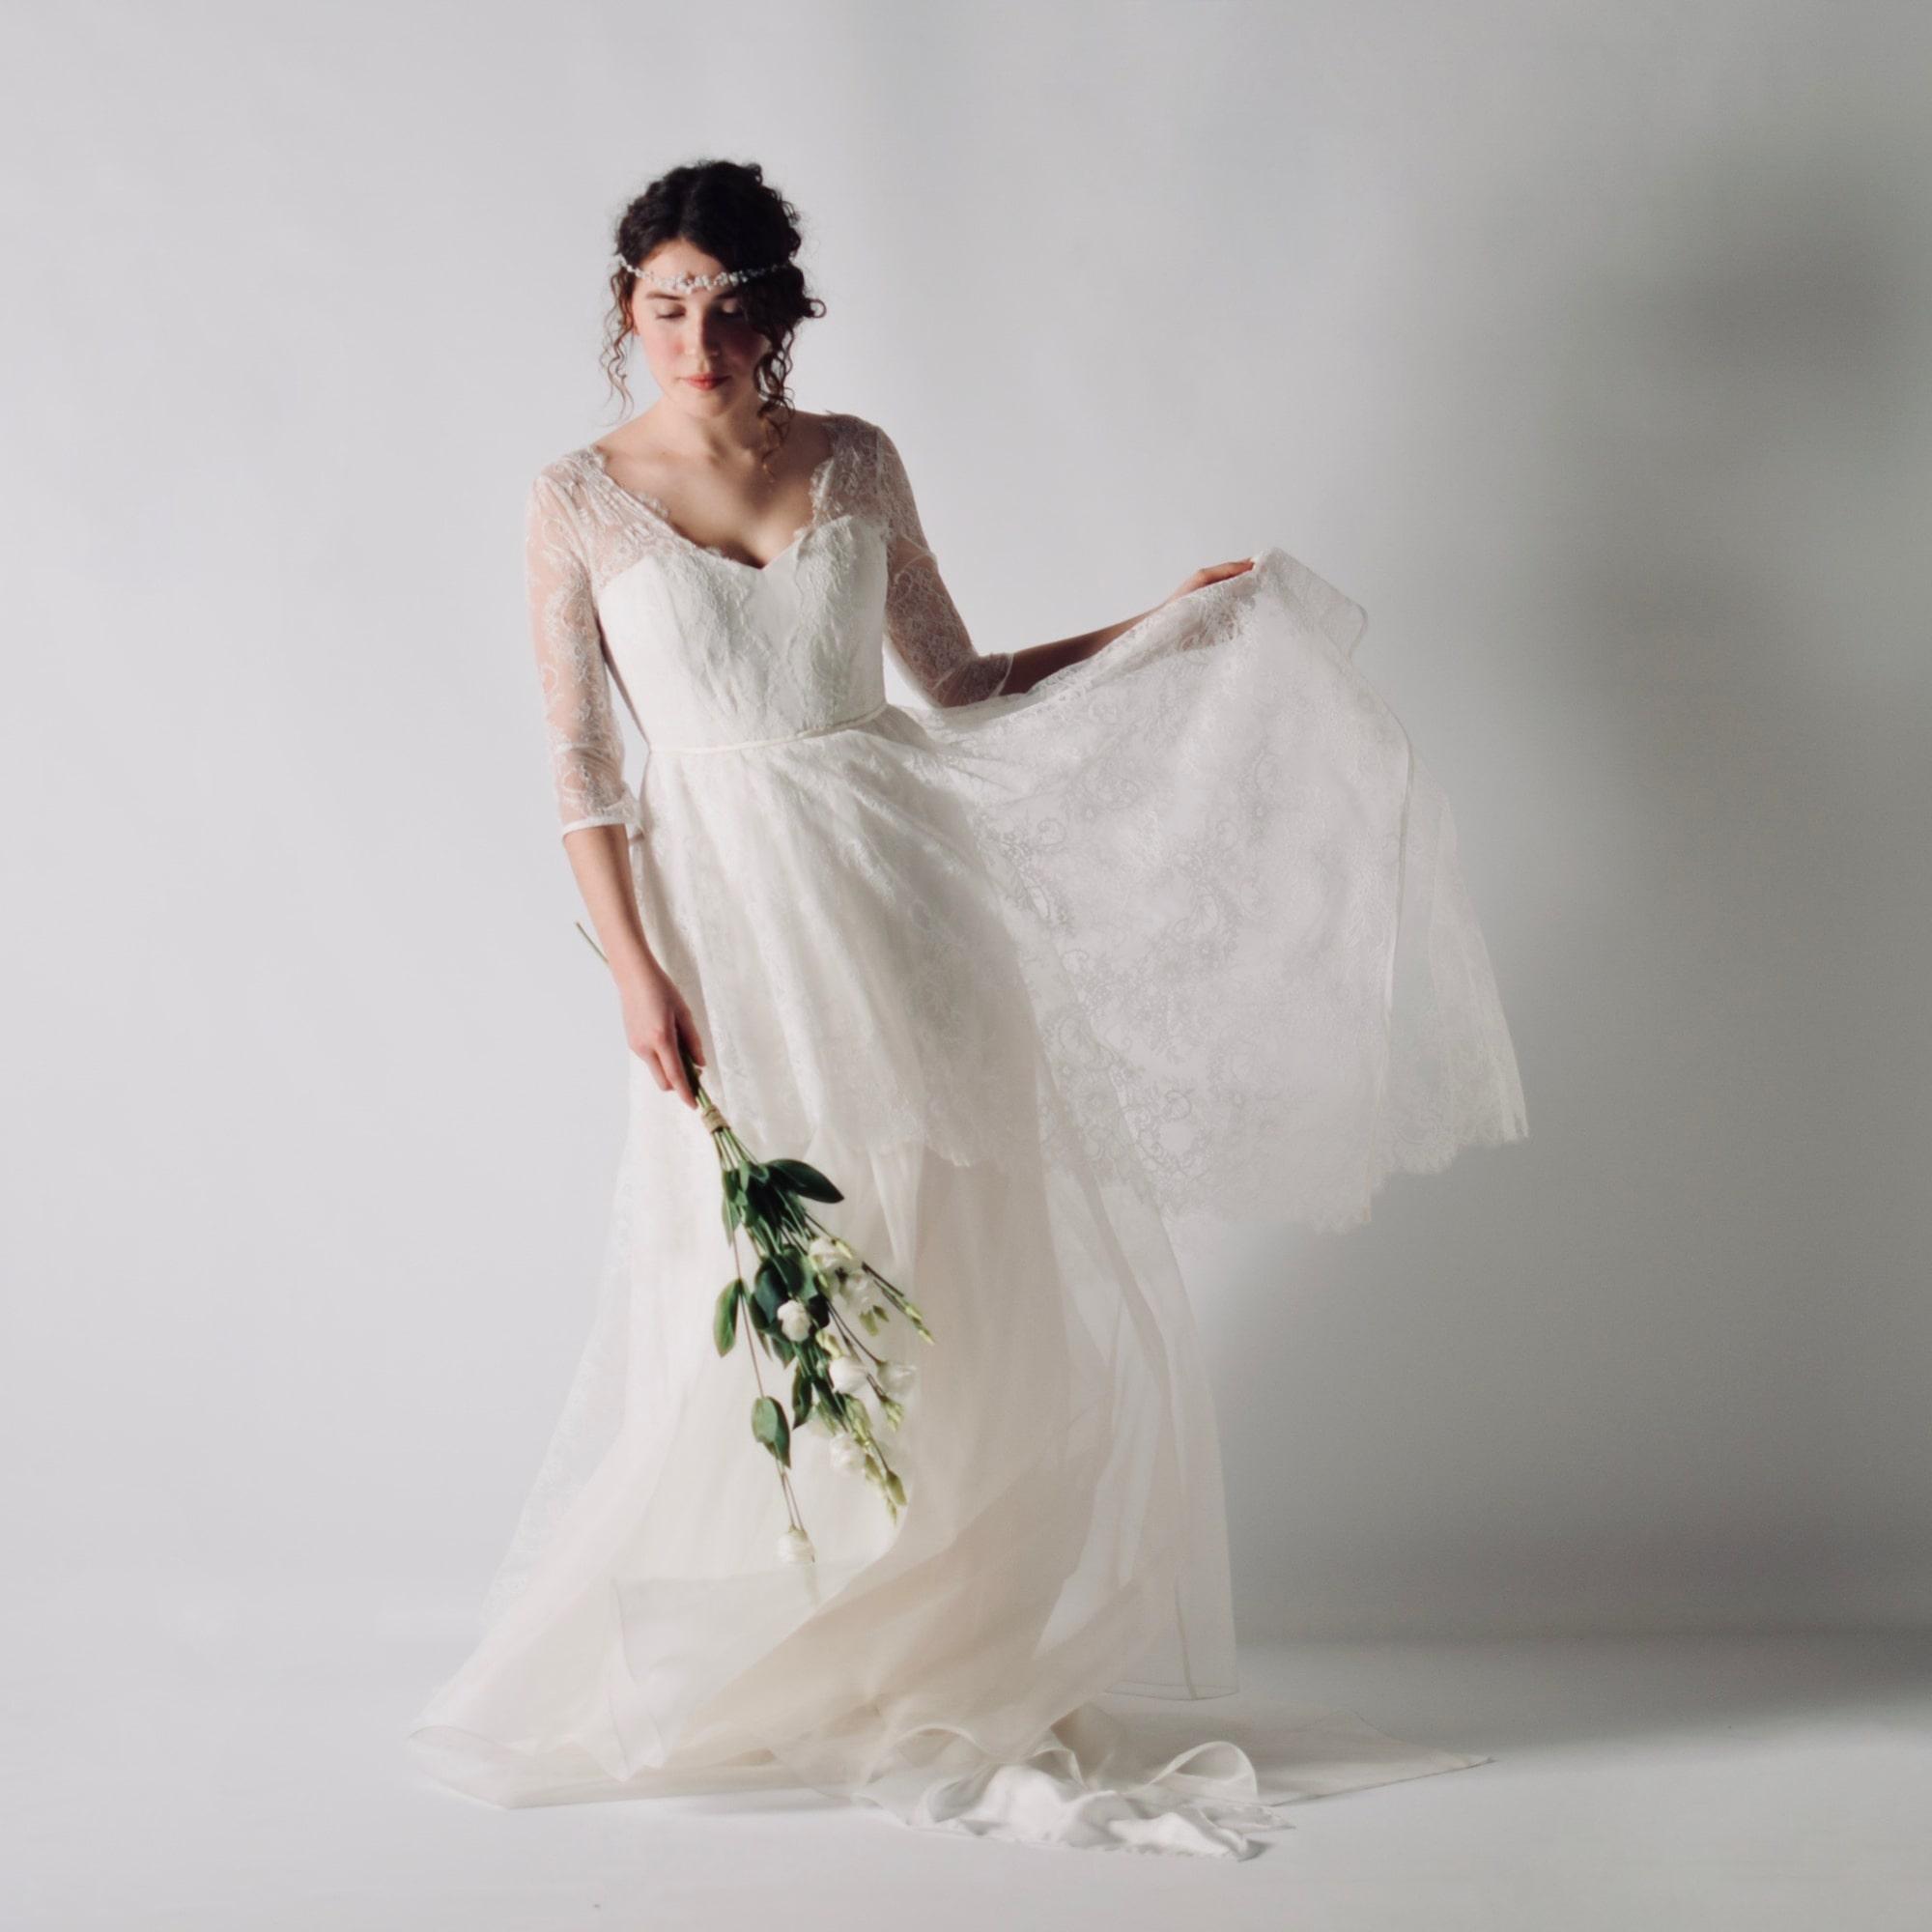 Abiti Da Sposa Zola Predosa.Aquilegia Lace Wedding Dress With Sleeves Larimeloom